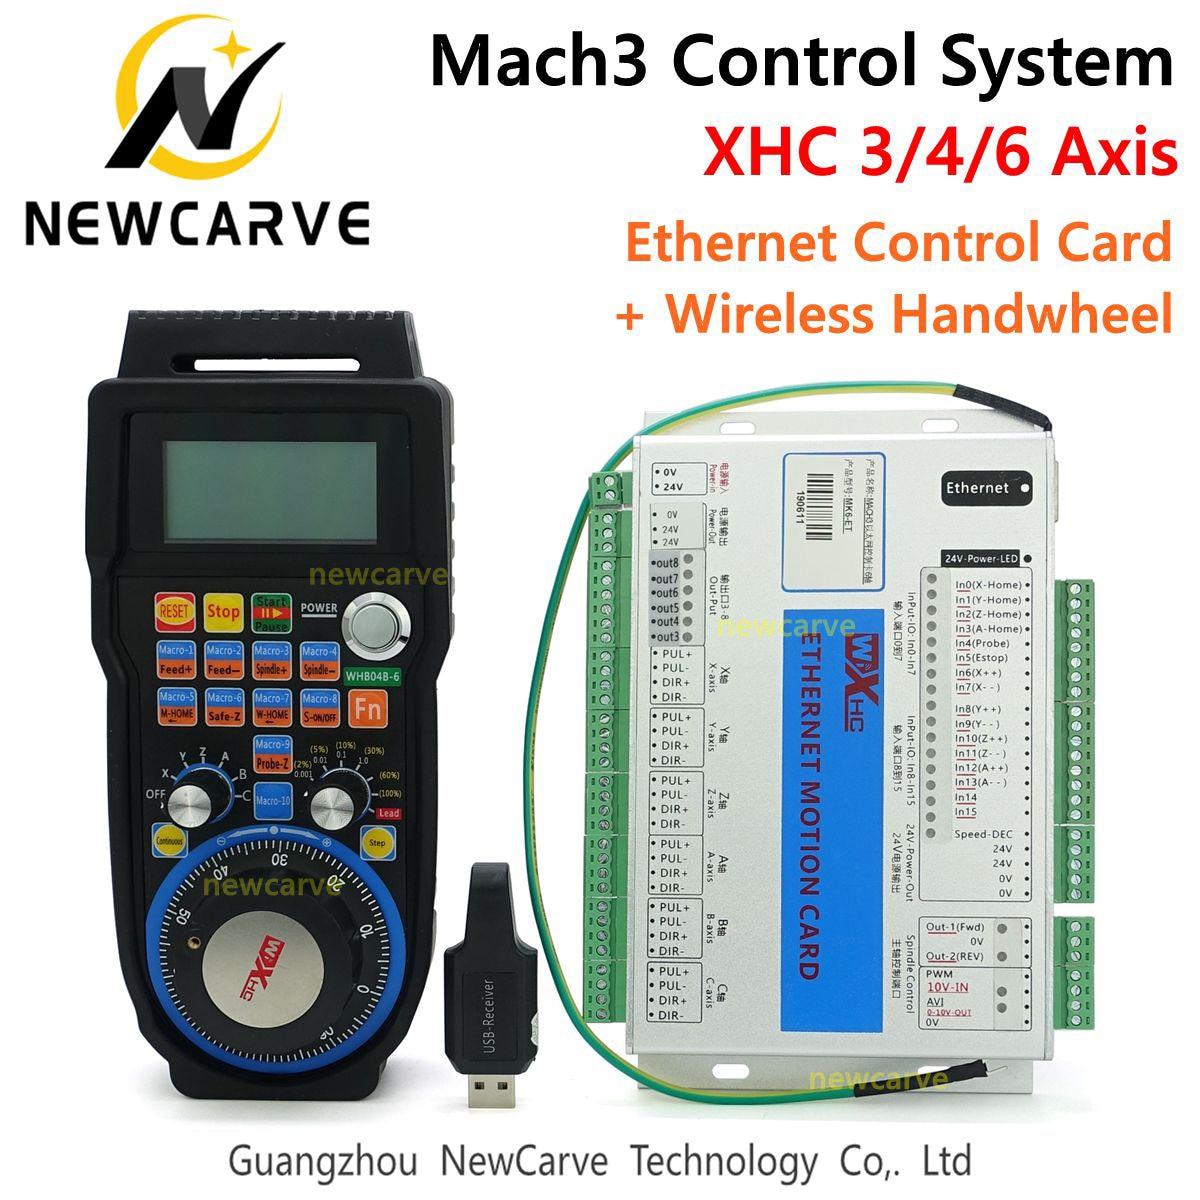 Mach3 مجموعة التحكم XHC 2MHz إيثرنت لوحة القطع 3 4 6 محور بطاقة التحكم في الحركة مع MPG اللاسلكية قلادة عقارب WHB04B